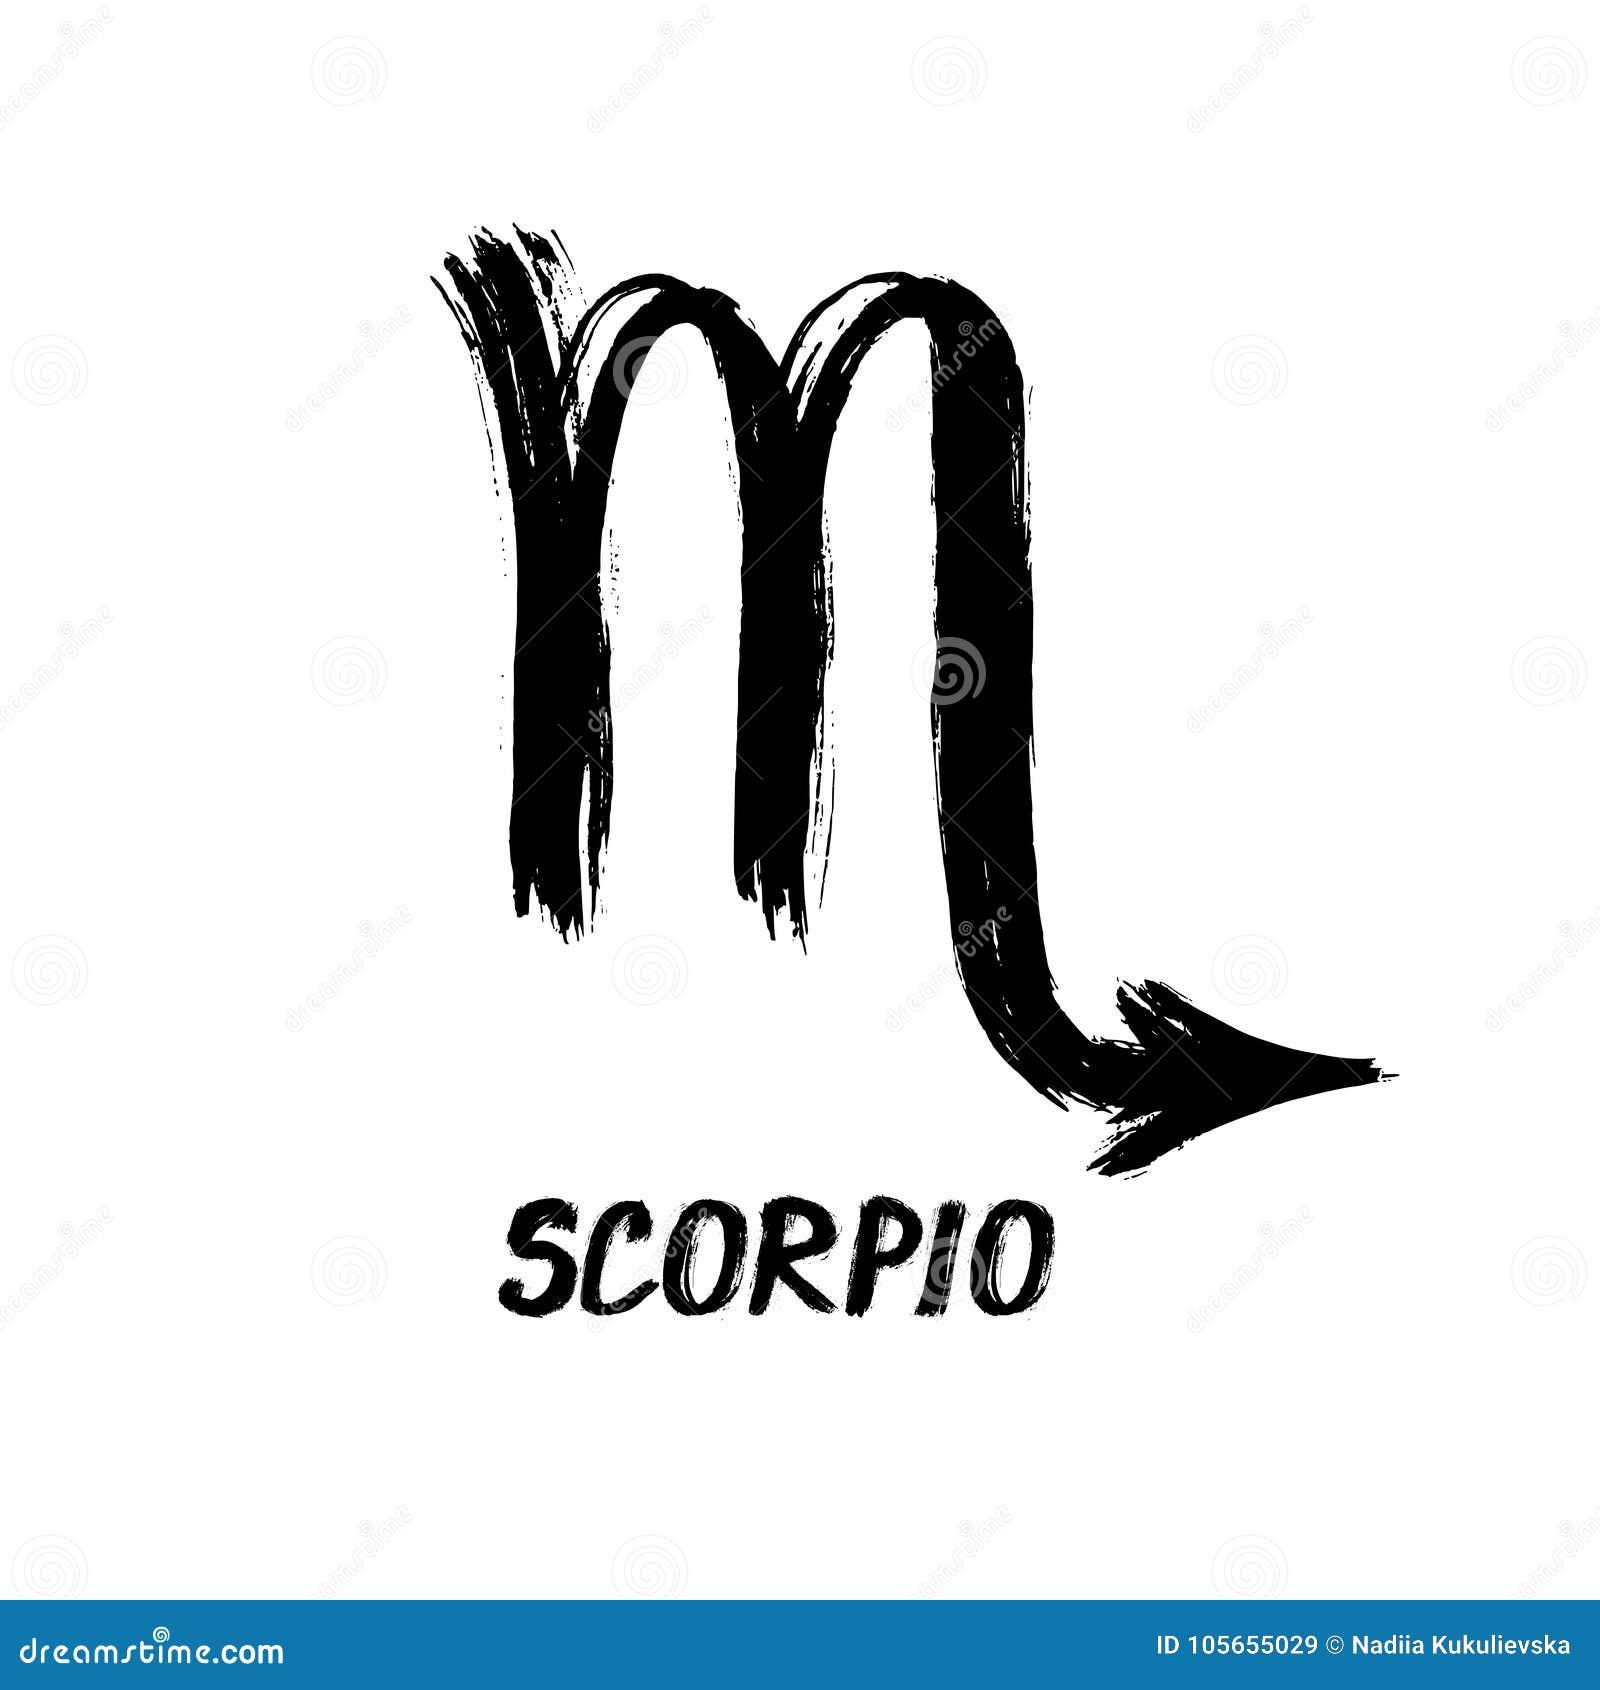 astrological signs scorpio and scorpio